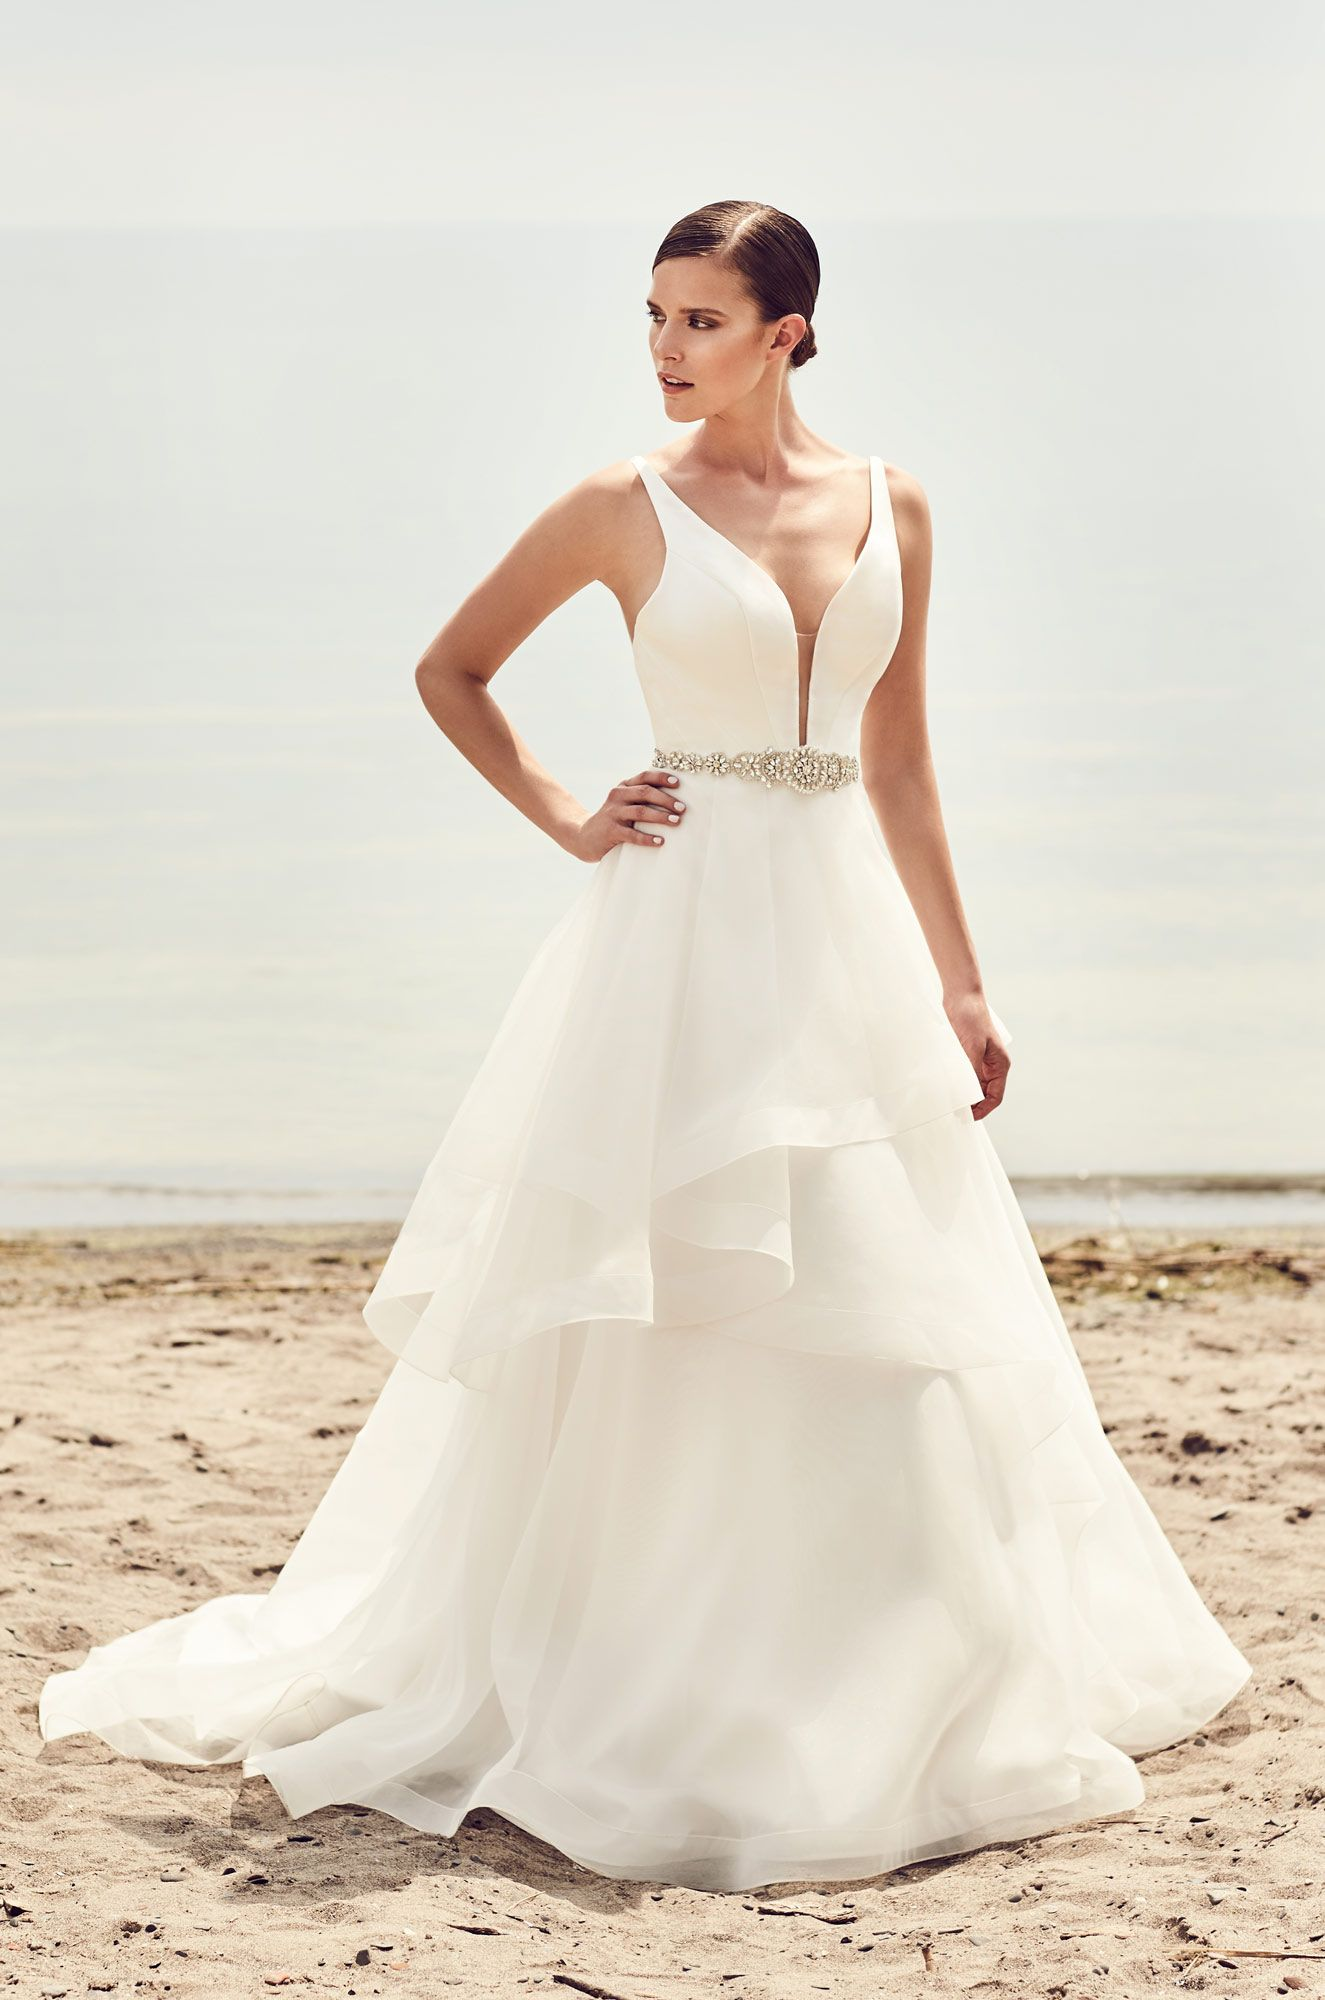 Tiered Organza Skirt Wedding Dress - Style  2112  43735508c000